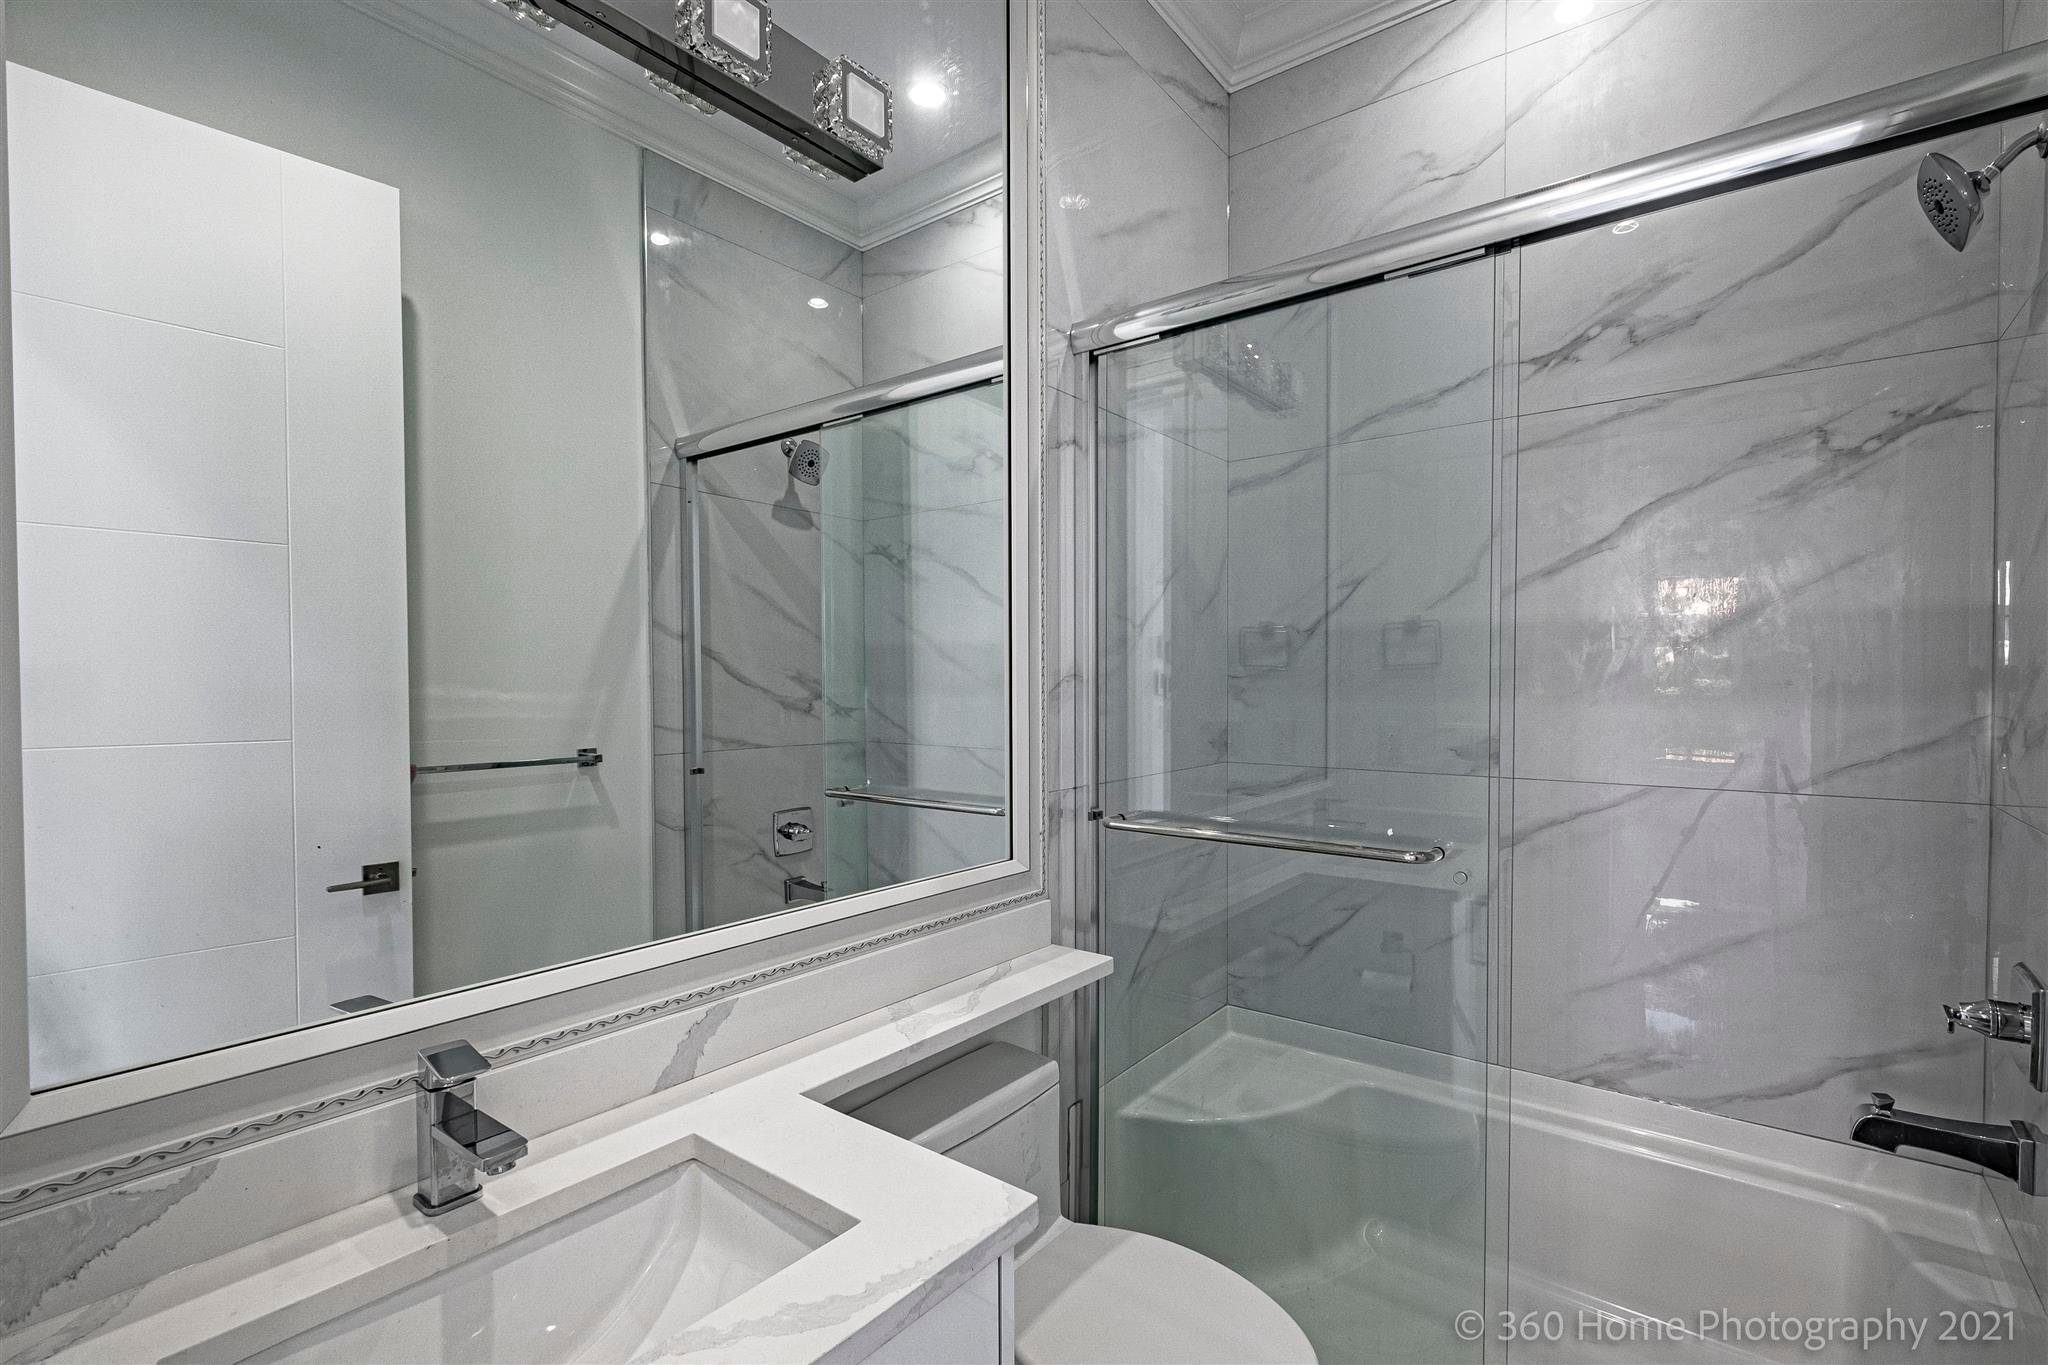 13050 101B AVENUE - Cedar Hills House/Single Family for sale, 5 Bedrooms (R2602208) - #13